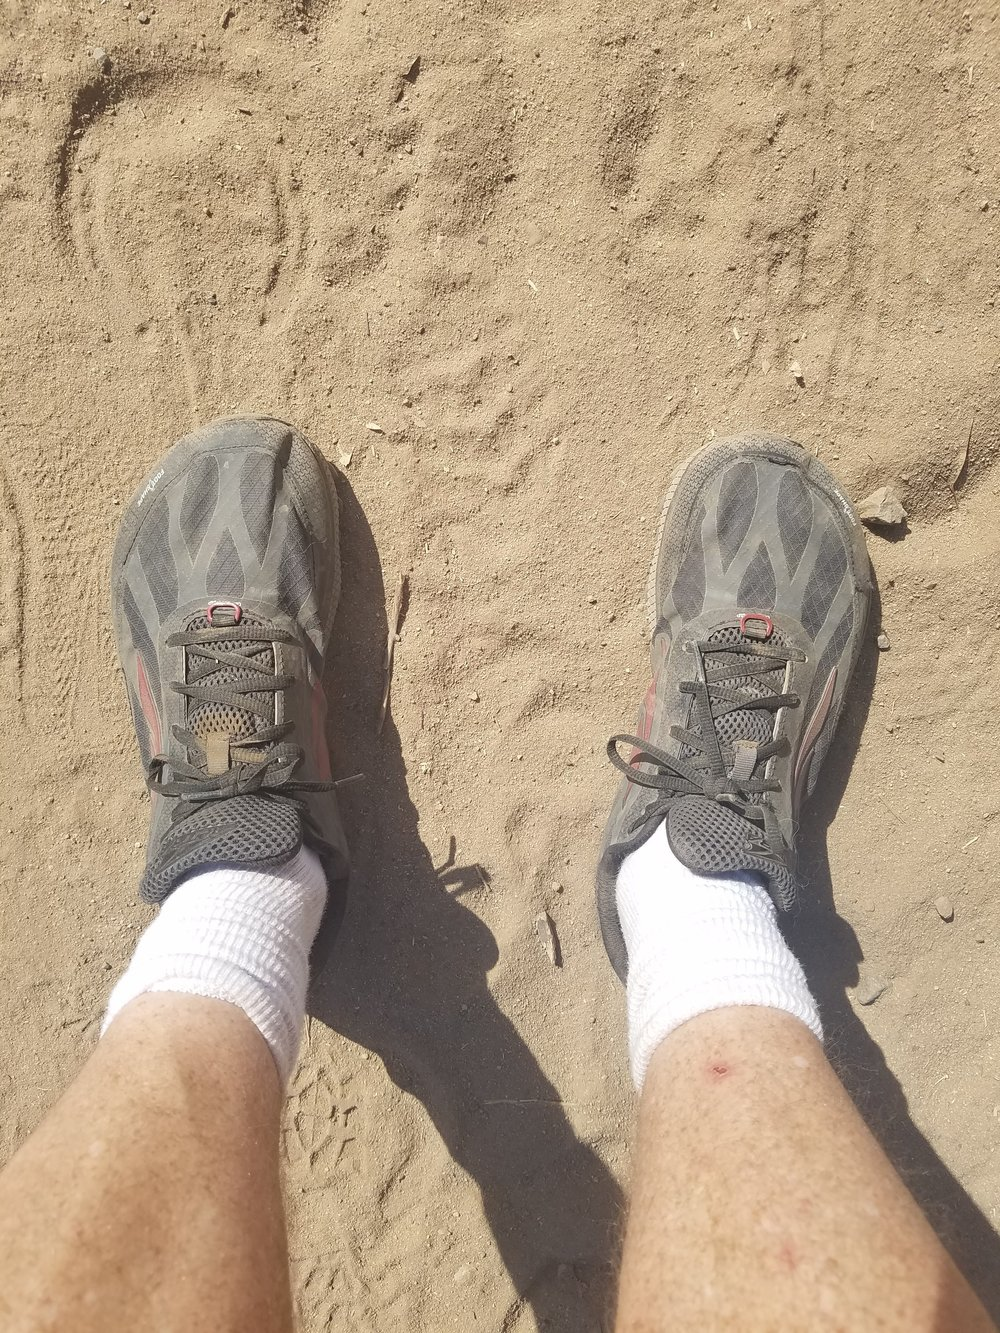 It's flat, but it's sand.